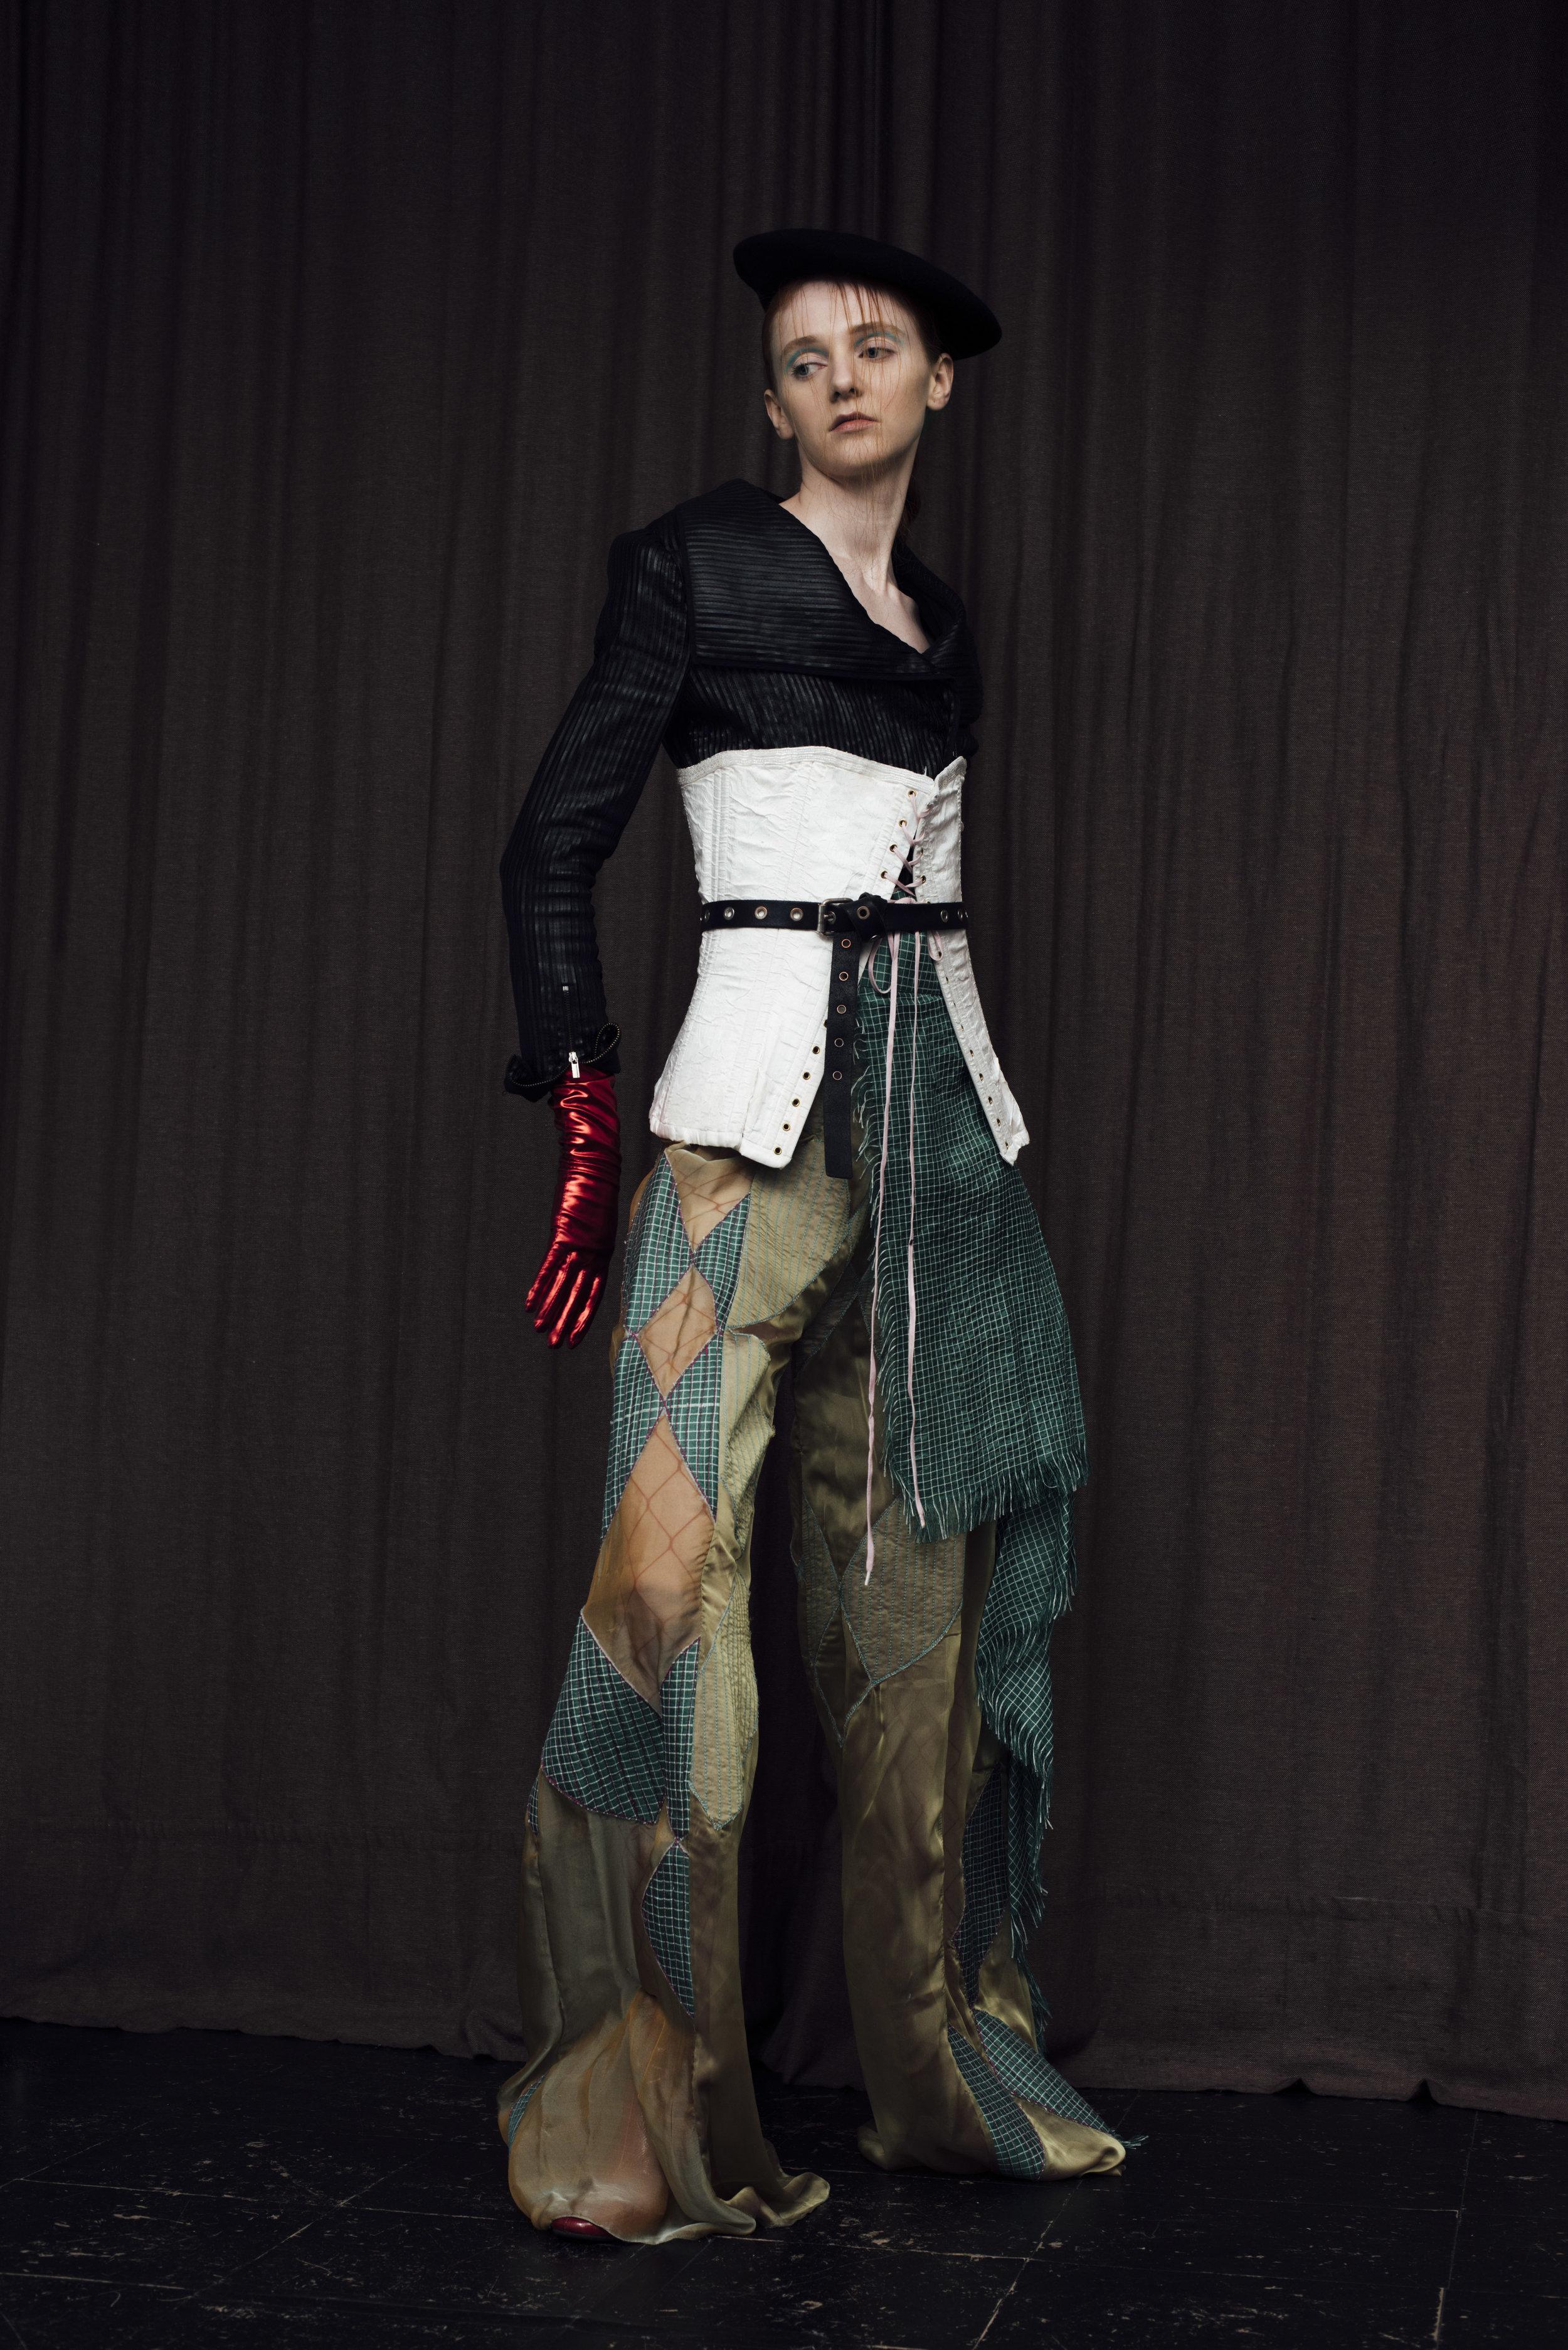 Jacket  BCBG , corset COSTUME STUDIO, trousers  CONSTANCE BLACKBALLER ,glove STYLIST'S OWN,beret  BEYOND RETRO